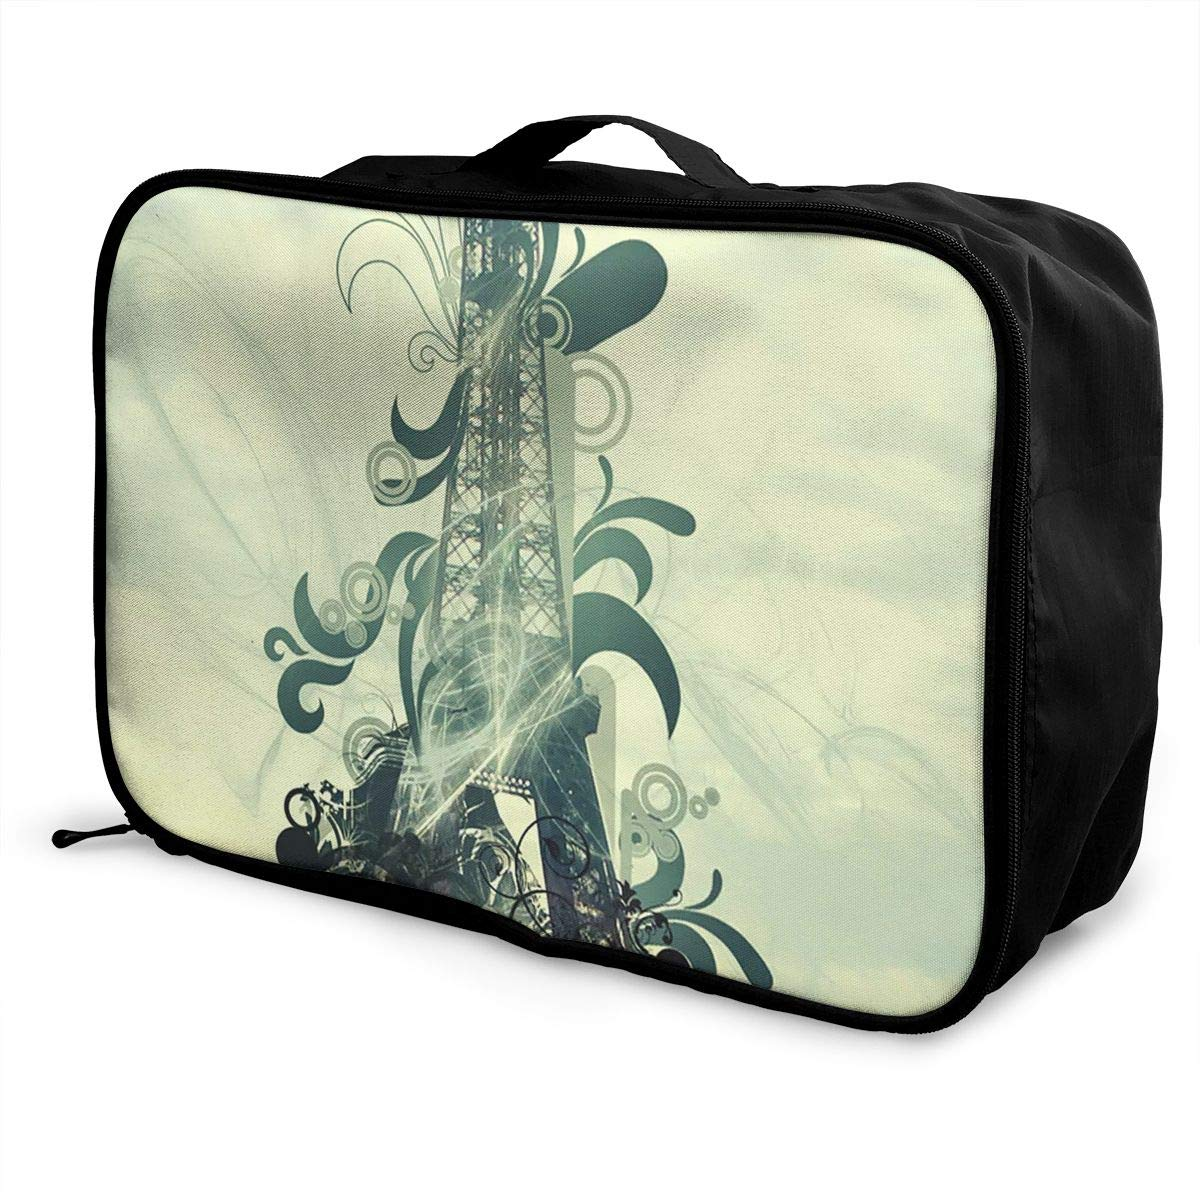 Travel Luggage Duffle Bag Lightweight Portable Handbag Eiffel Tower Floral Pattern Large Capacity Waterproof Foldable Storage Tote